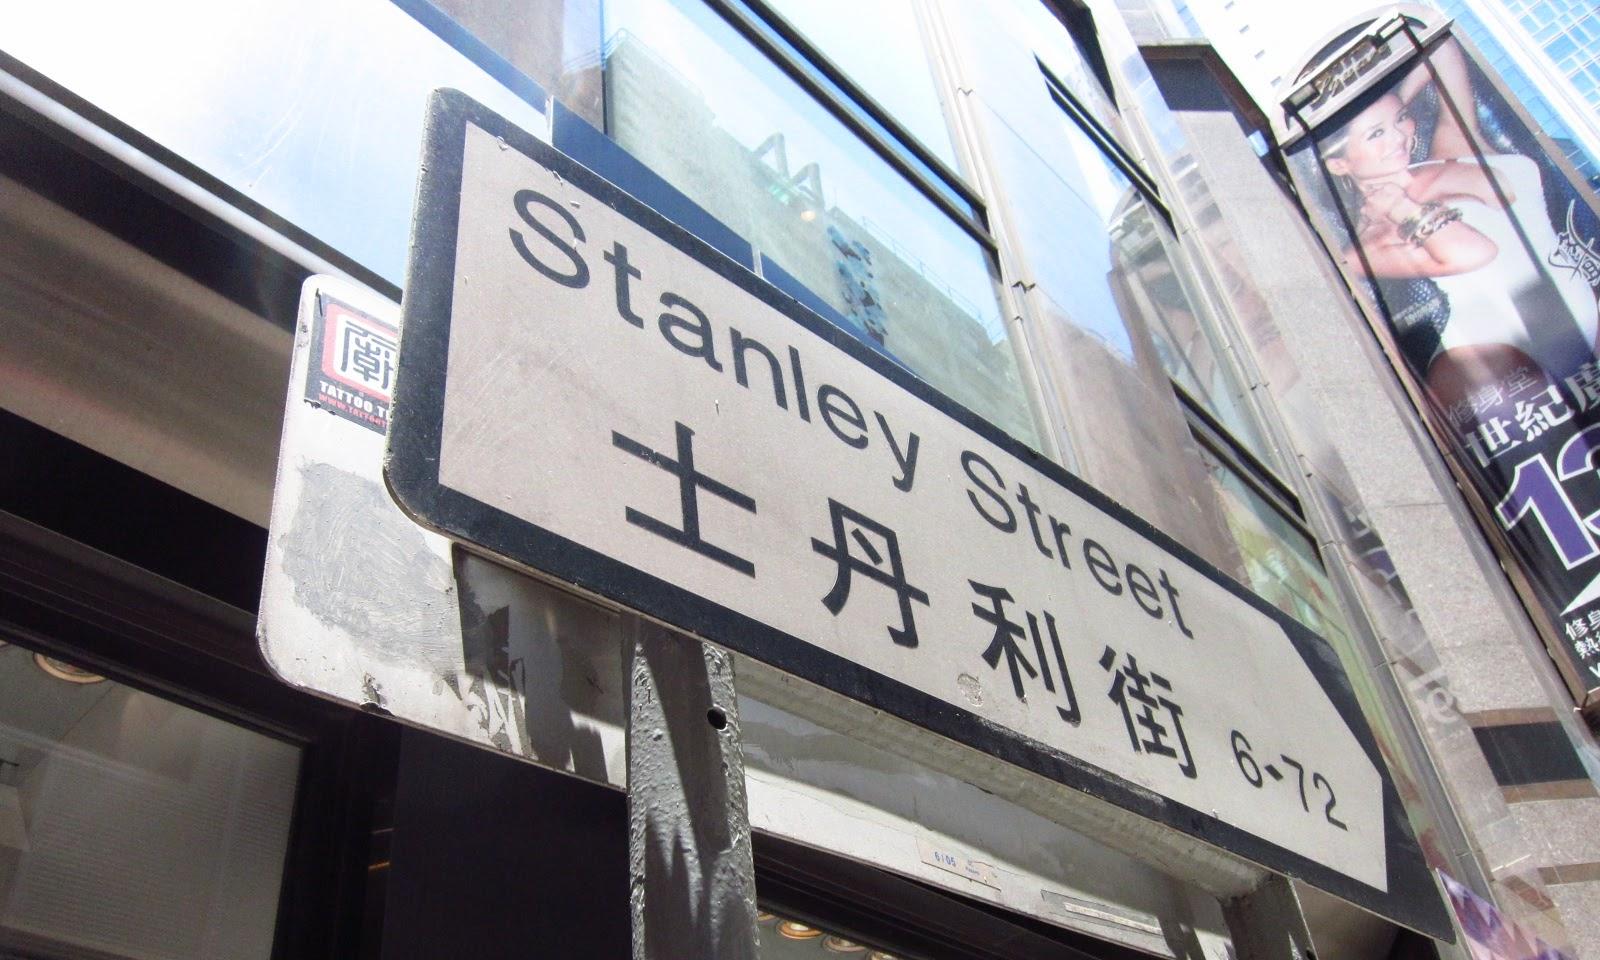 HongKong 2011 Photolog - Day 5: Stanley Street, Luk Yu Tea House, Avenue of Stars